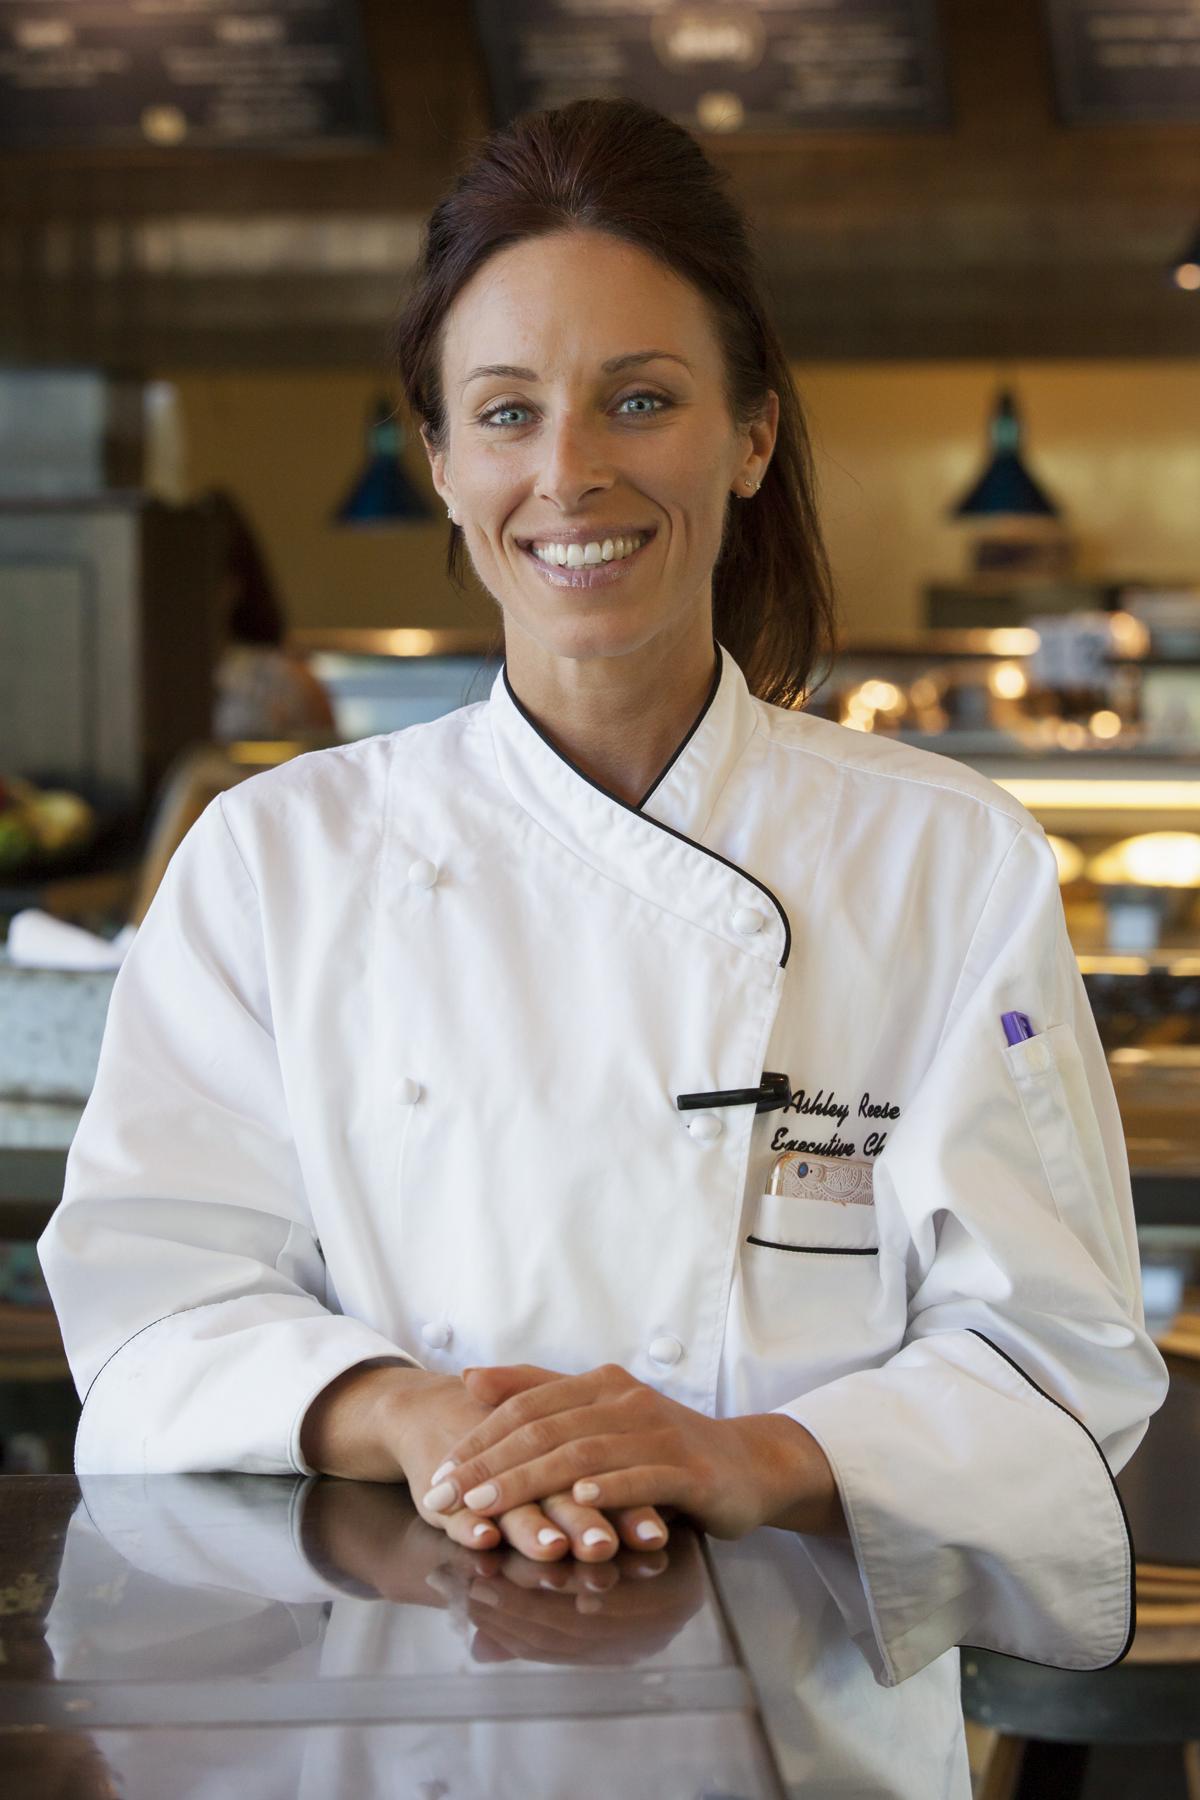 Moving To North Carolina >> Female Perspective on Restaurant Industry and Smashing Stigma | Modern Restaurant Management ...